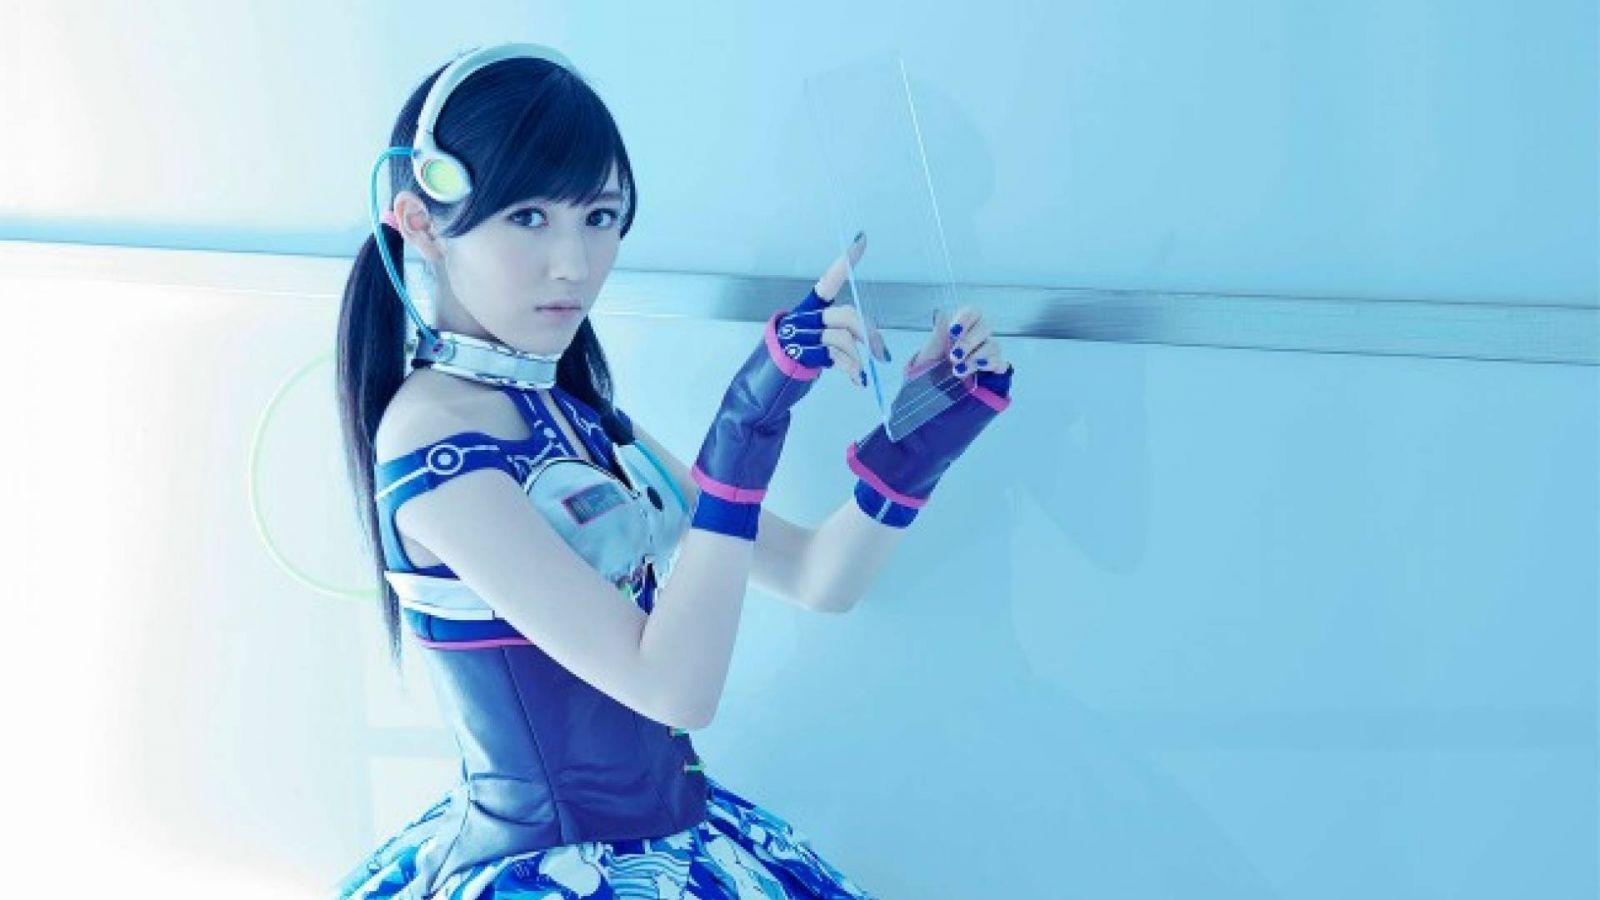 Watanabe Mayu © Sony Music Entertainment (Japan) Inc.